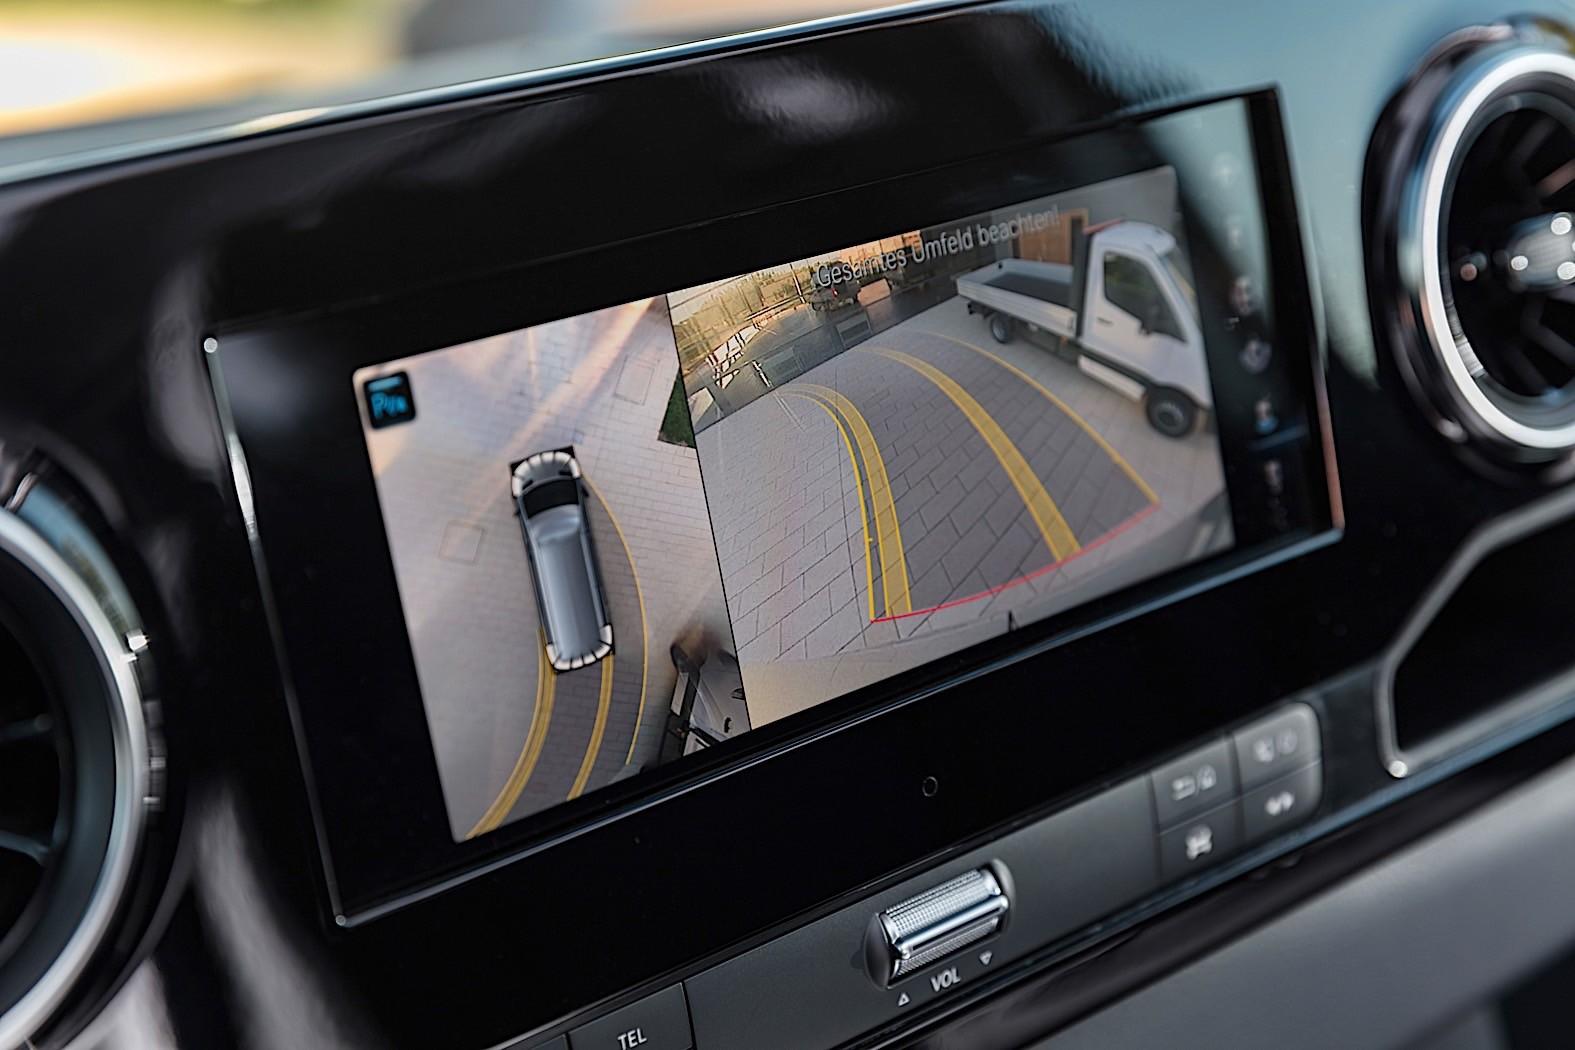 Mercedes benz sprinter based rv reviewed by autoblog for Mercedes benz printer